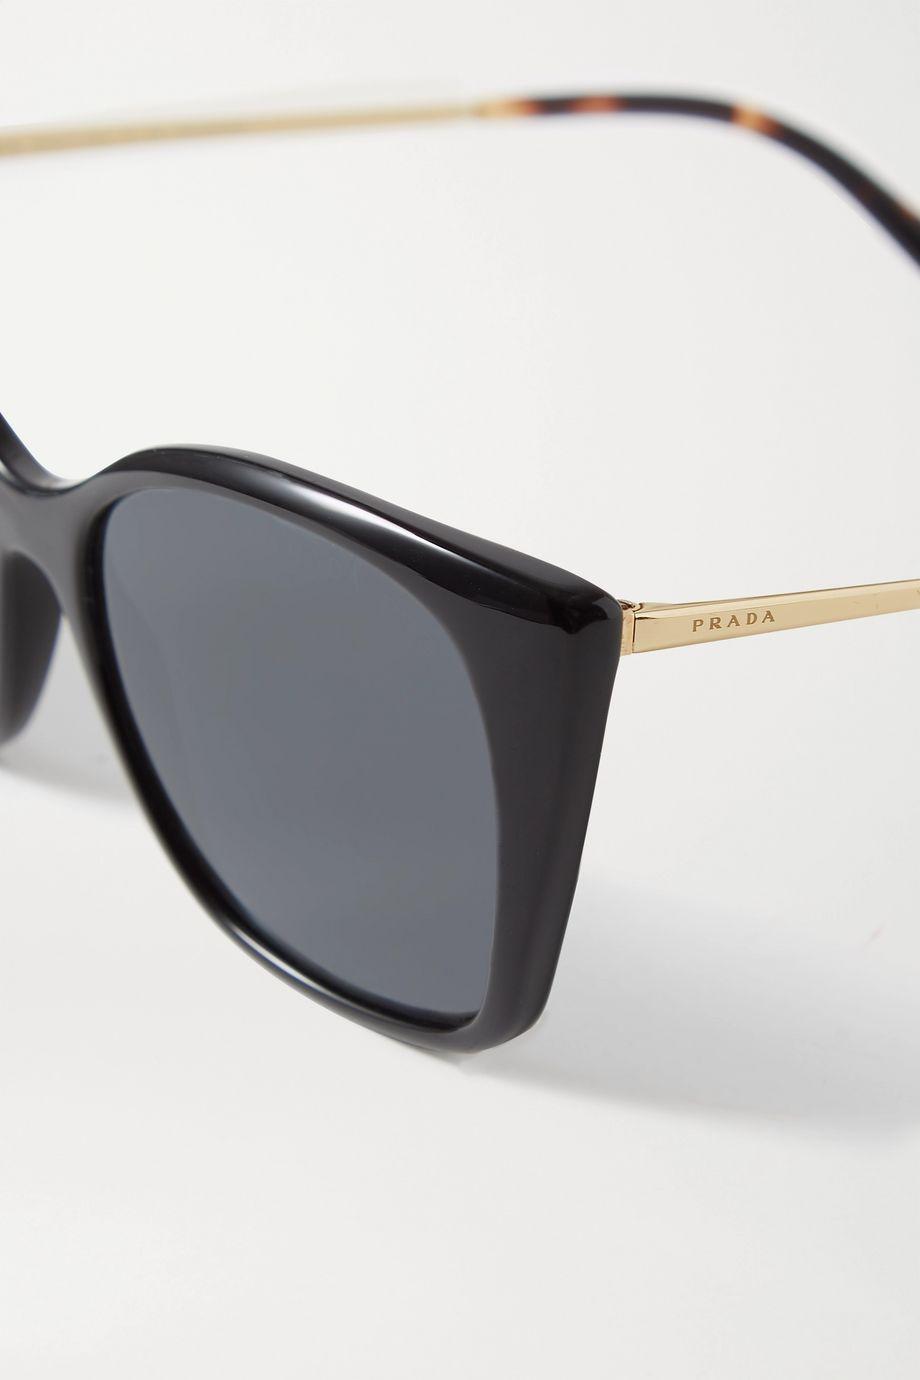 Prada Square-frame acetate and gold-tone sunglasses